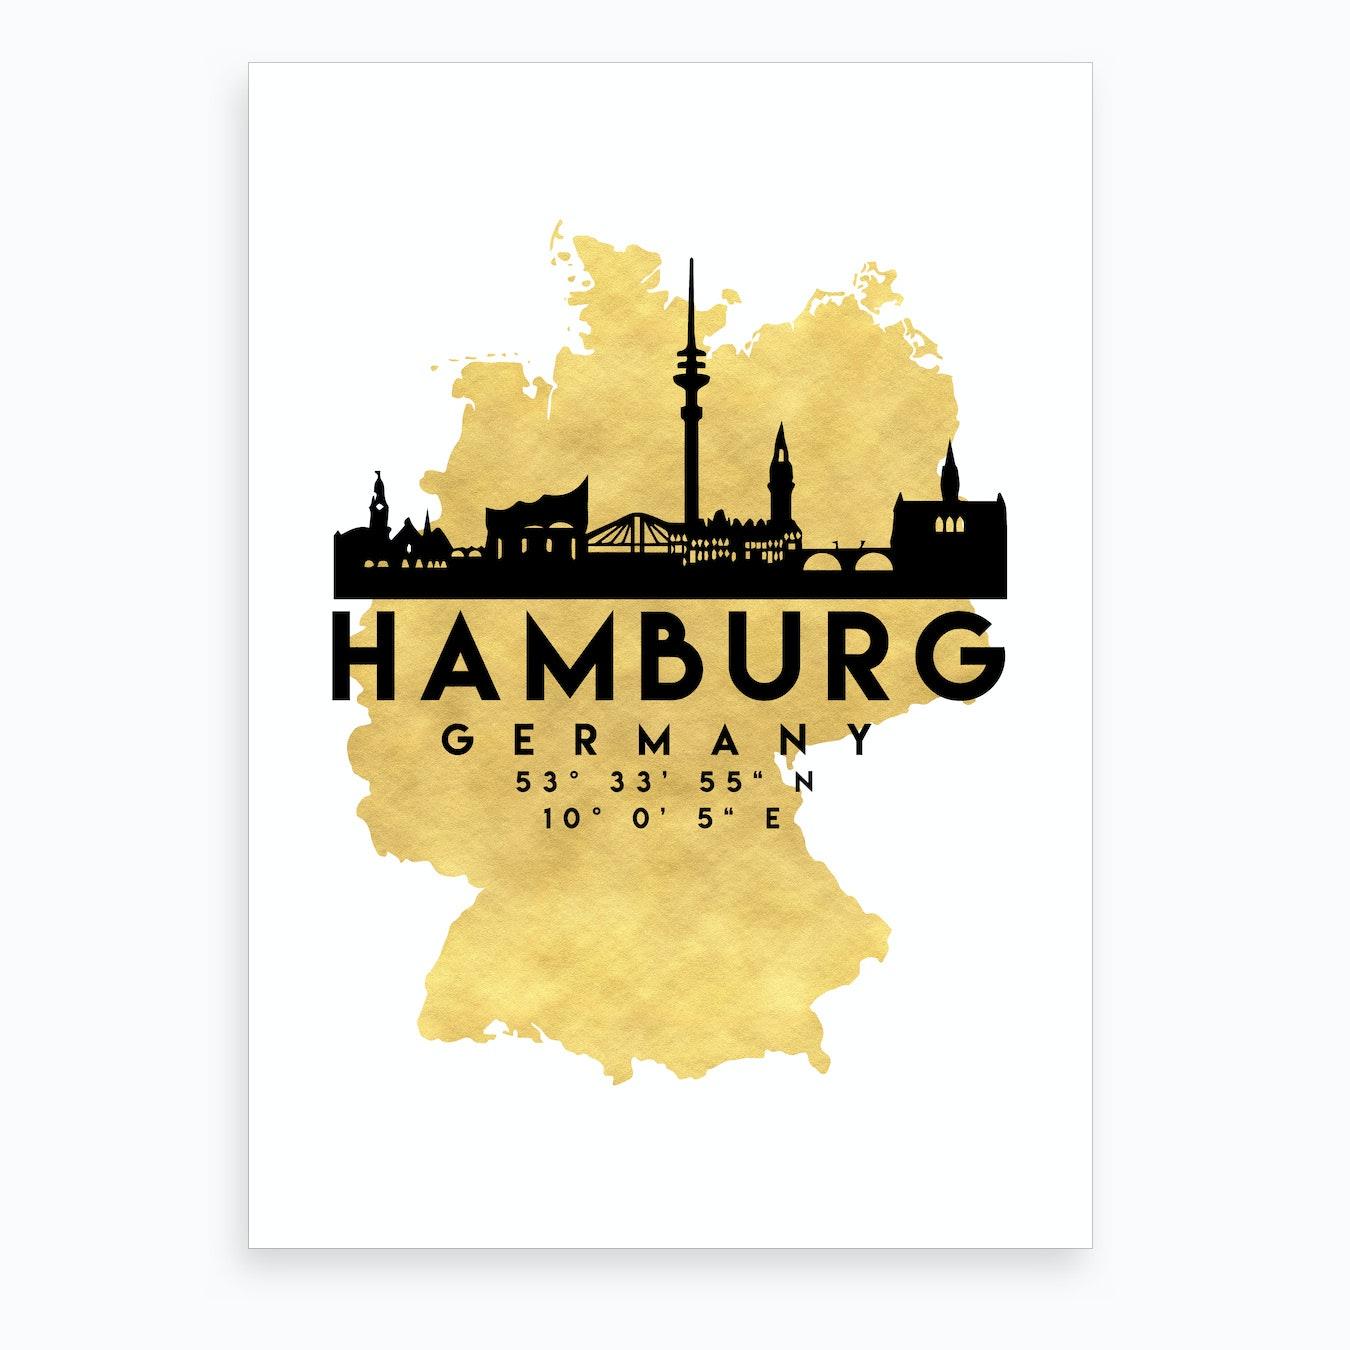 Map Of Germany Hamburg.Hamburg Germany Silhouette City Skyline Map